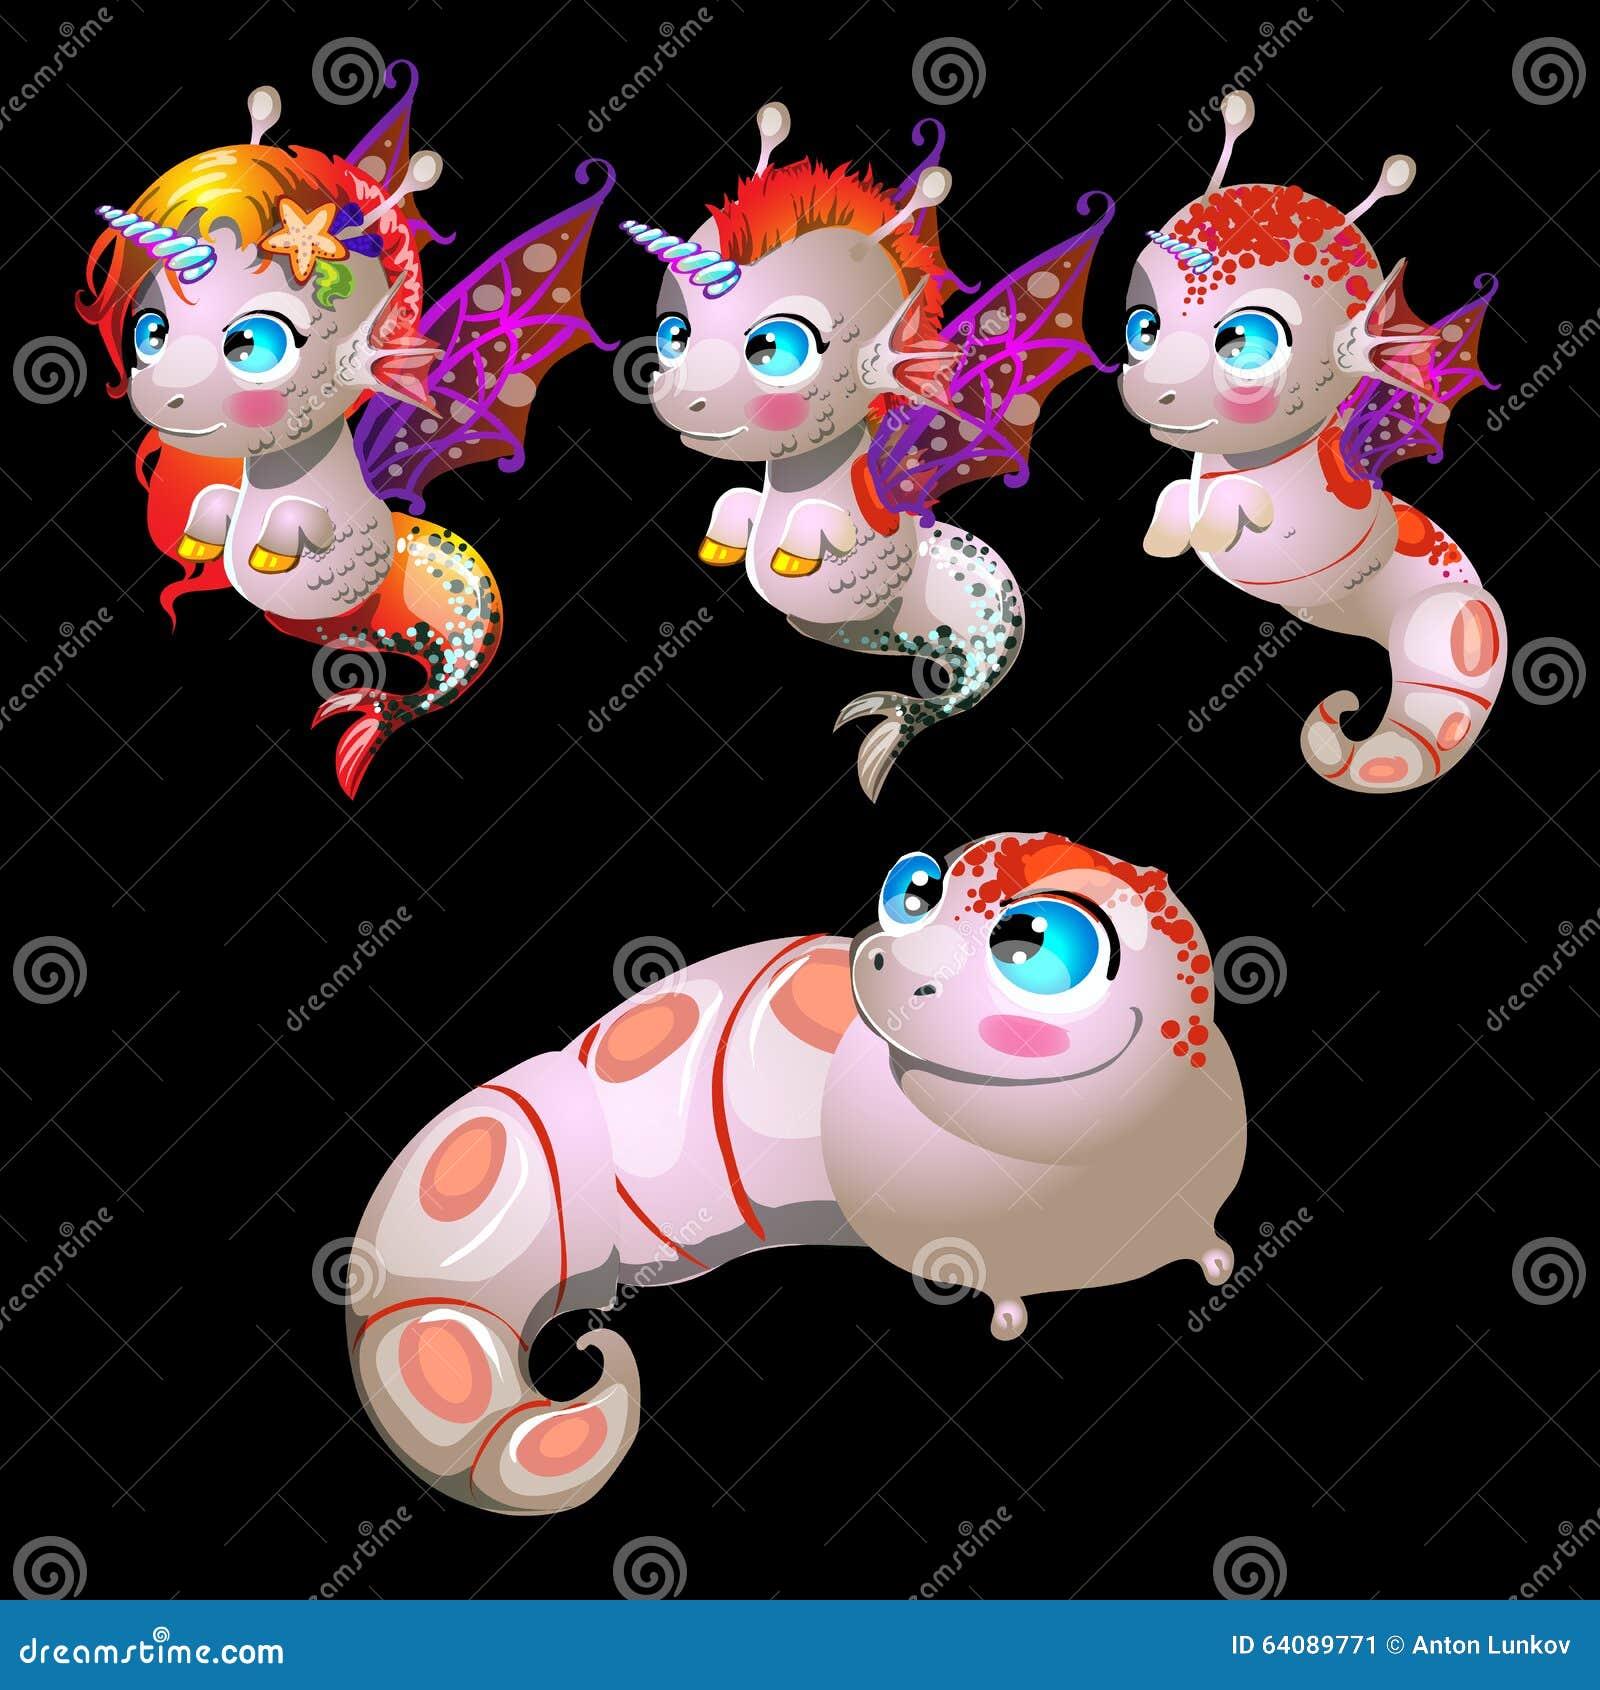 fish unicorns male and female characters stock vector image